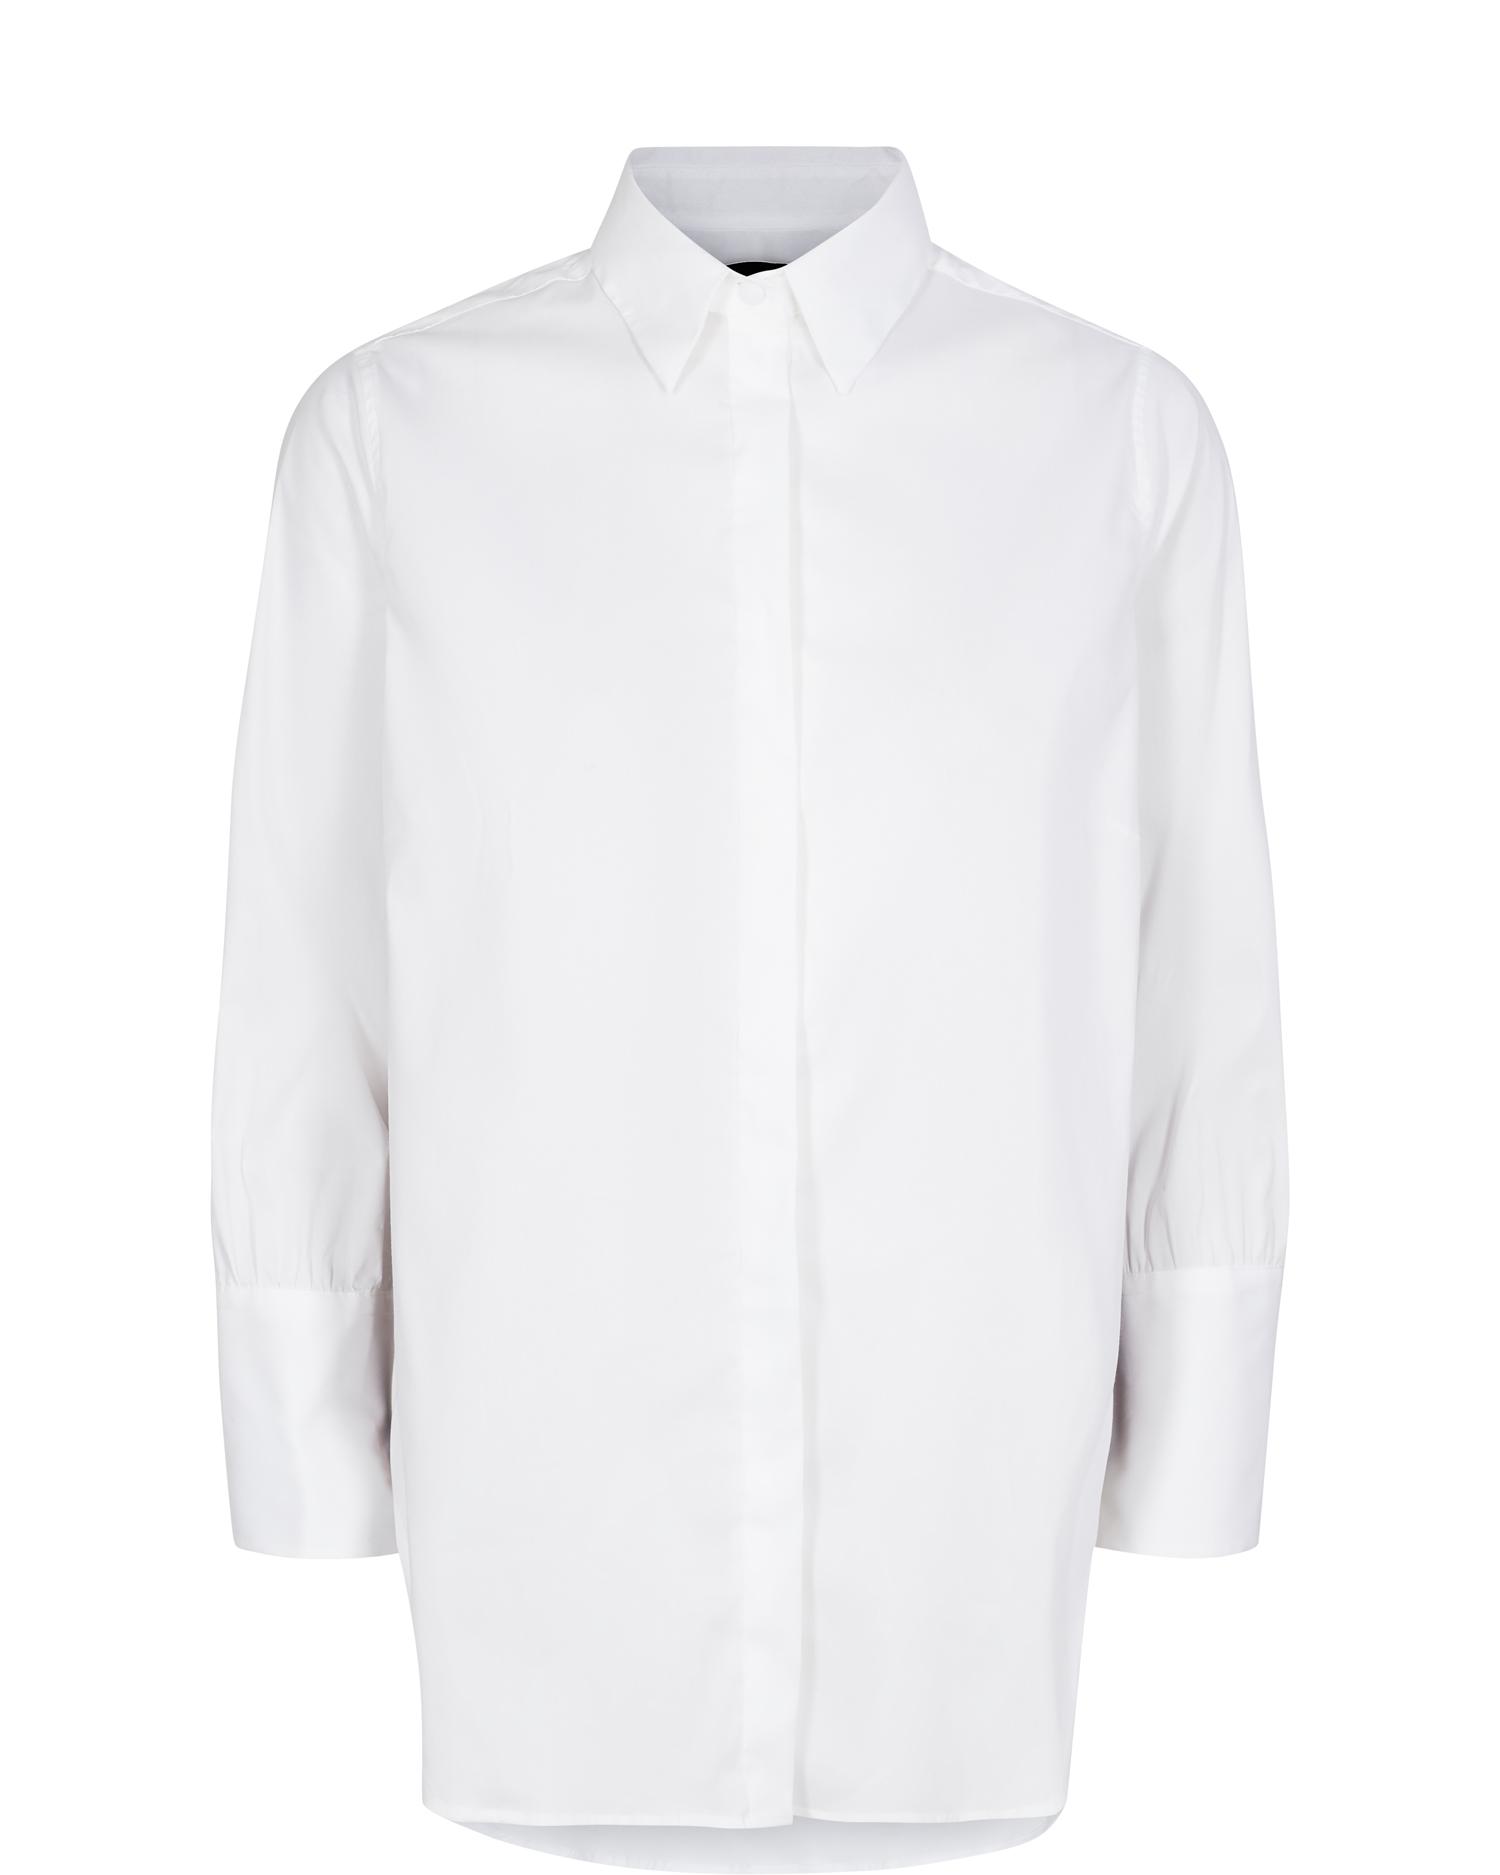 Witte dames blouse Mos Mosh - Larina Ribbon Shirt 7/8 - 129050-101